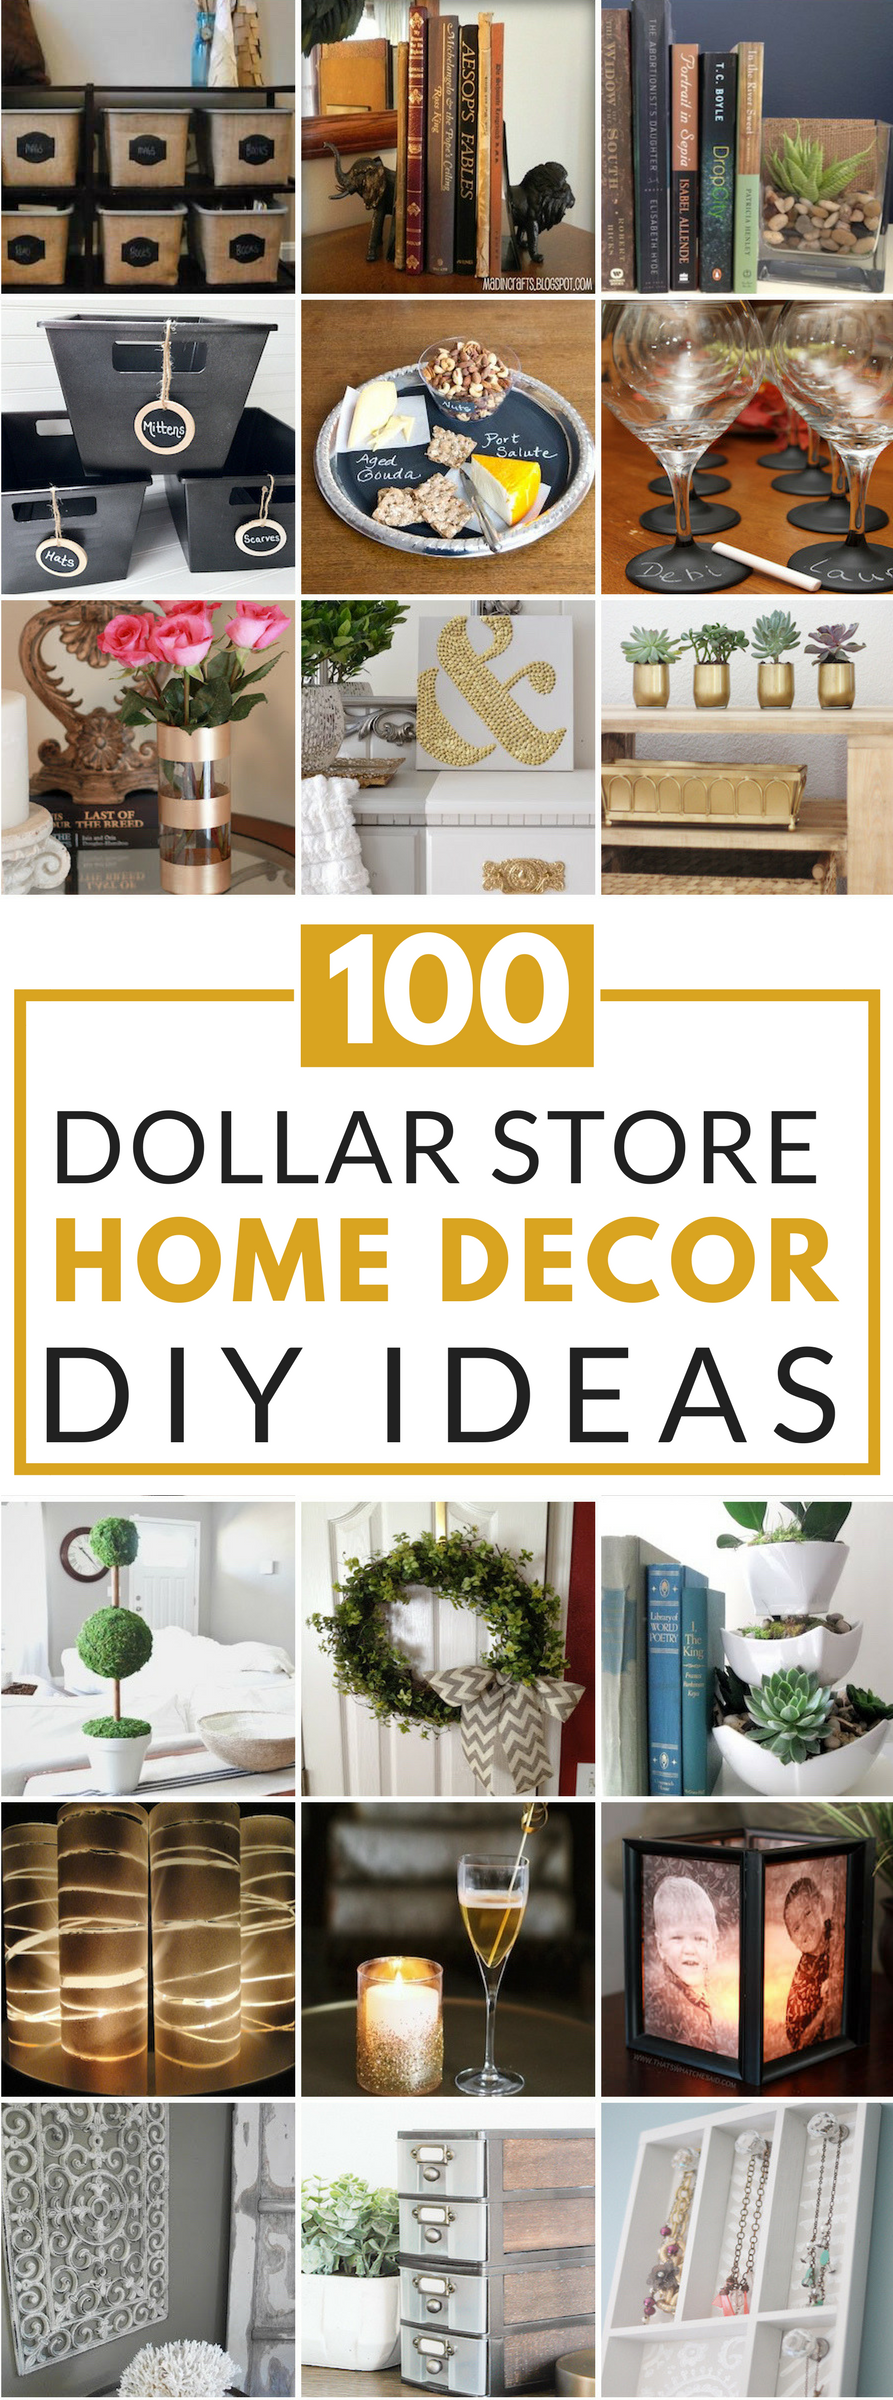 100 Dollar Store Diy Home Decor Ideas Dollar Store Decor Dollar